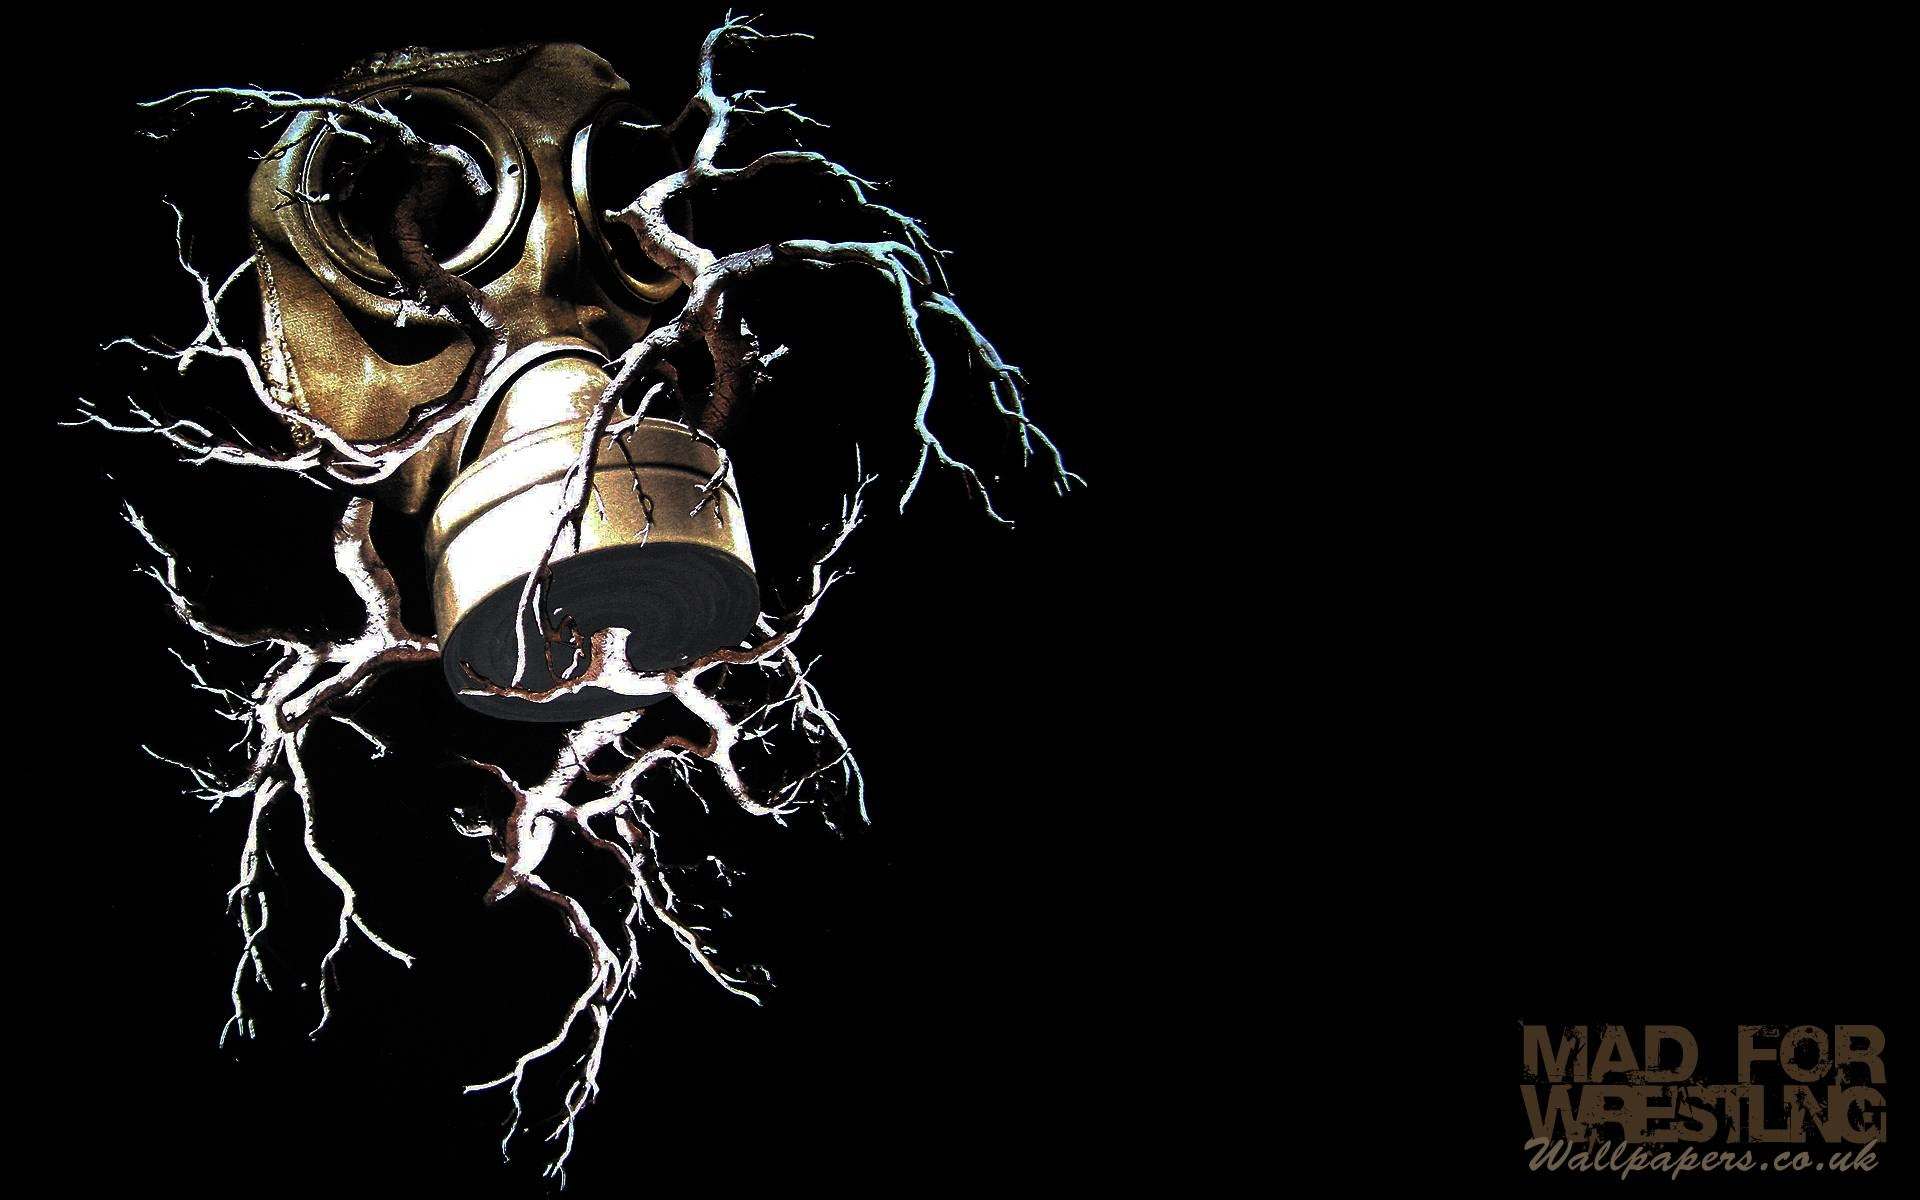 Randy orton viper logo - photo#45